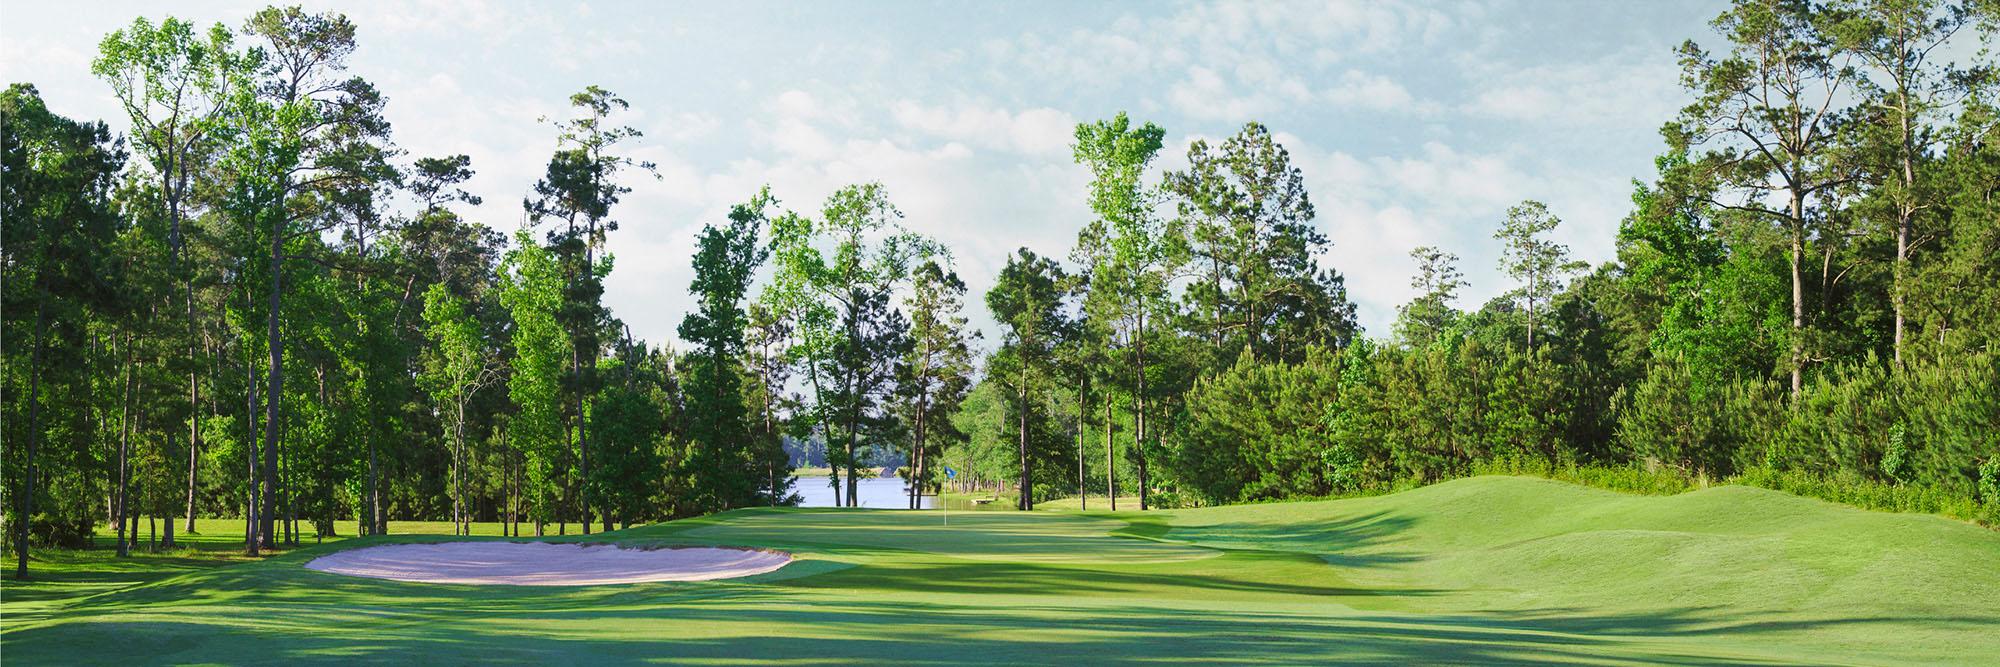 Golf Course Image - Canongate-Lake Windcrest Course No. 6